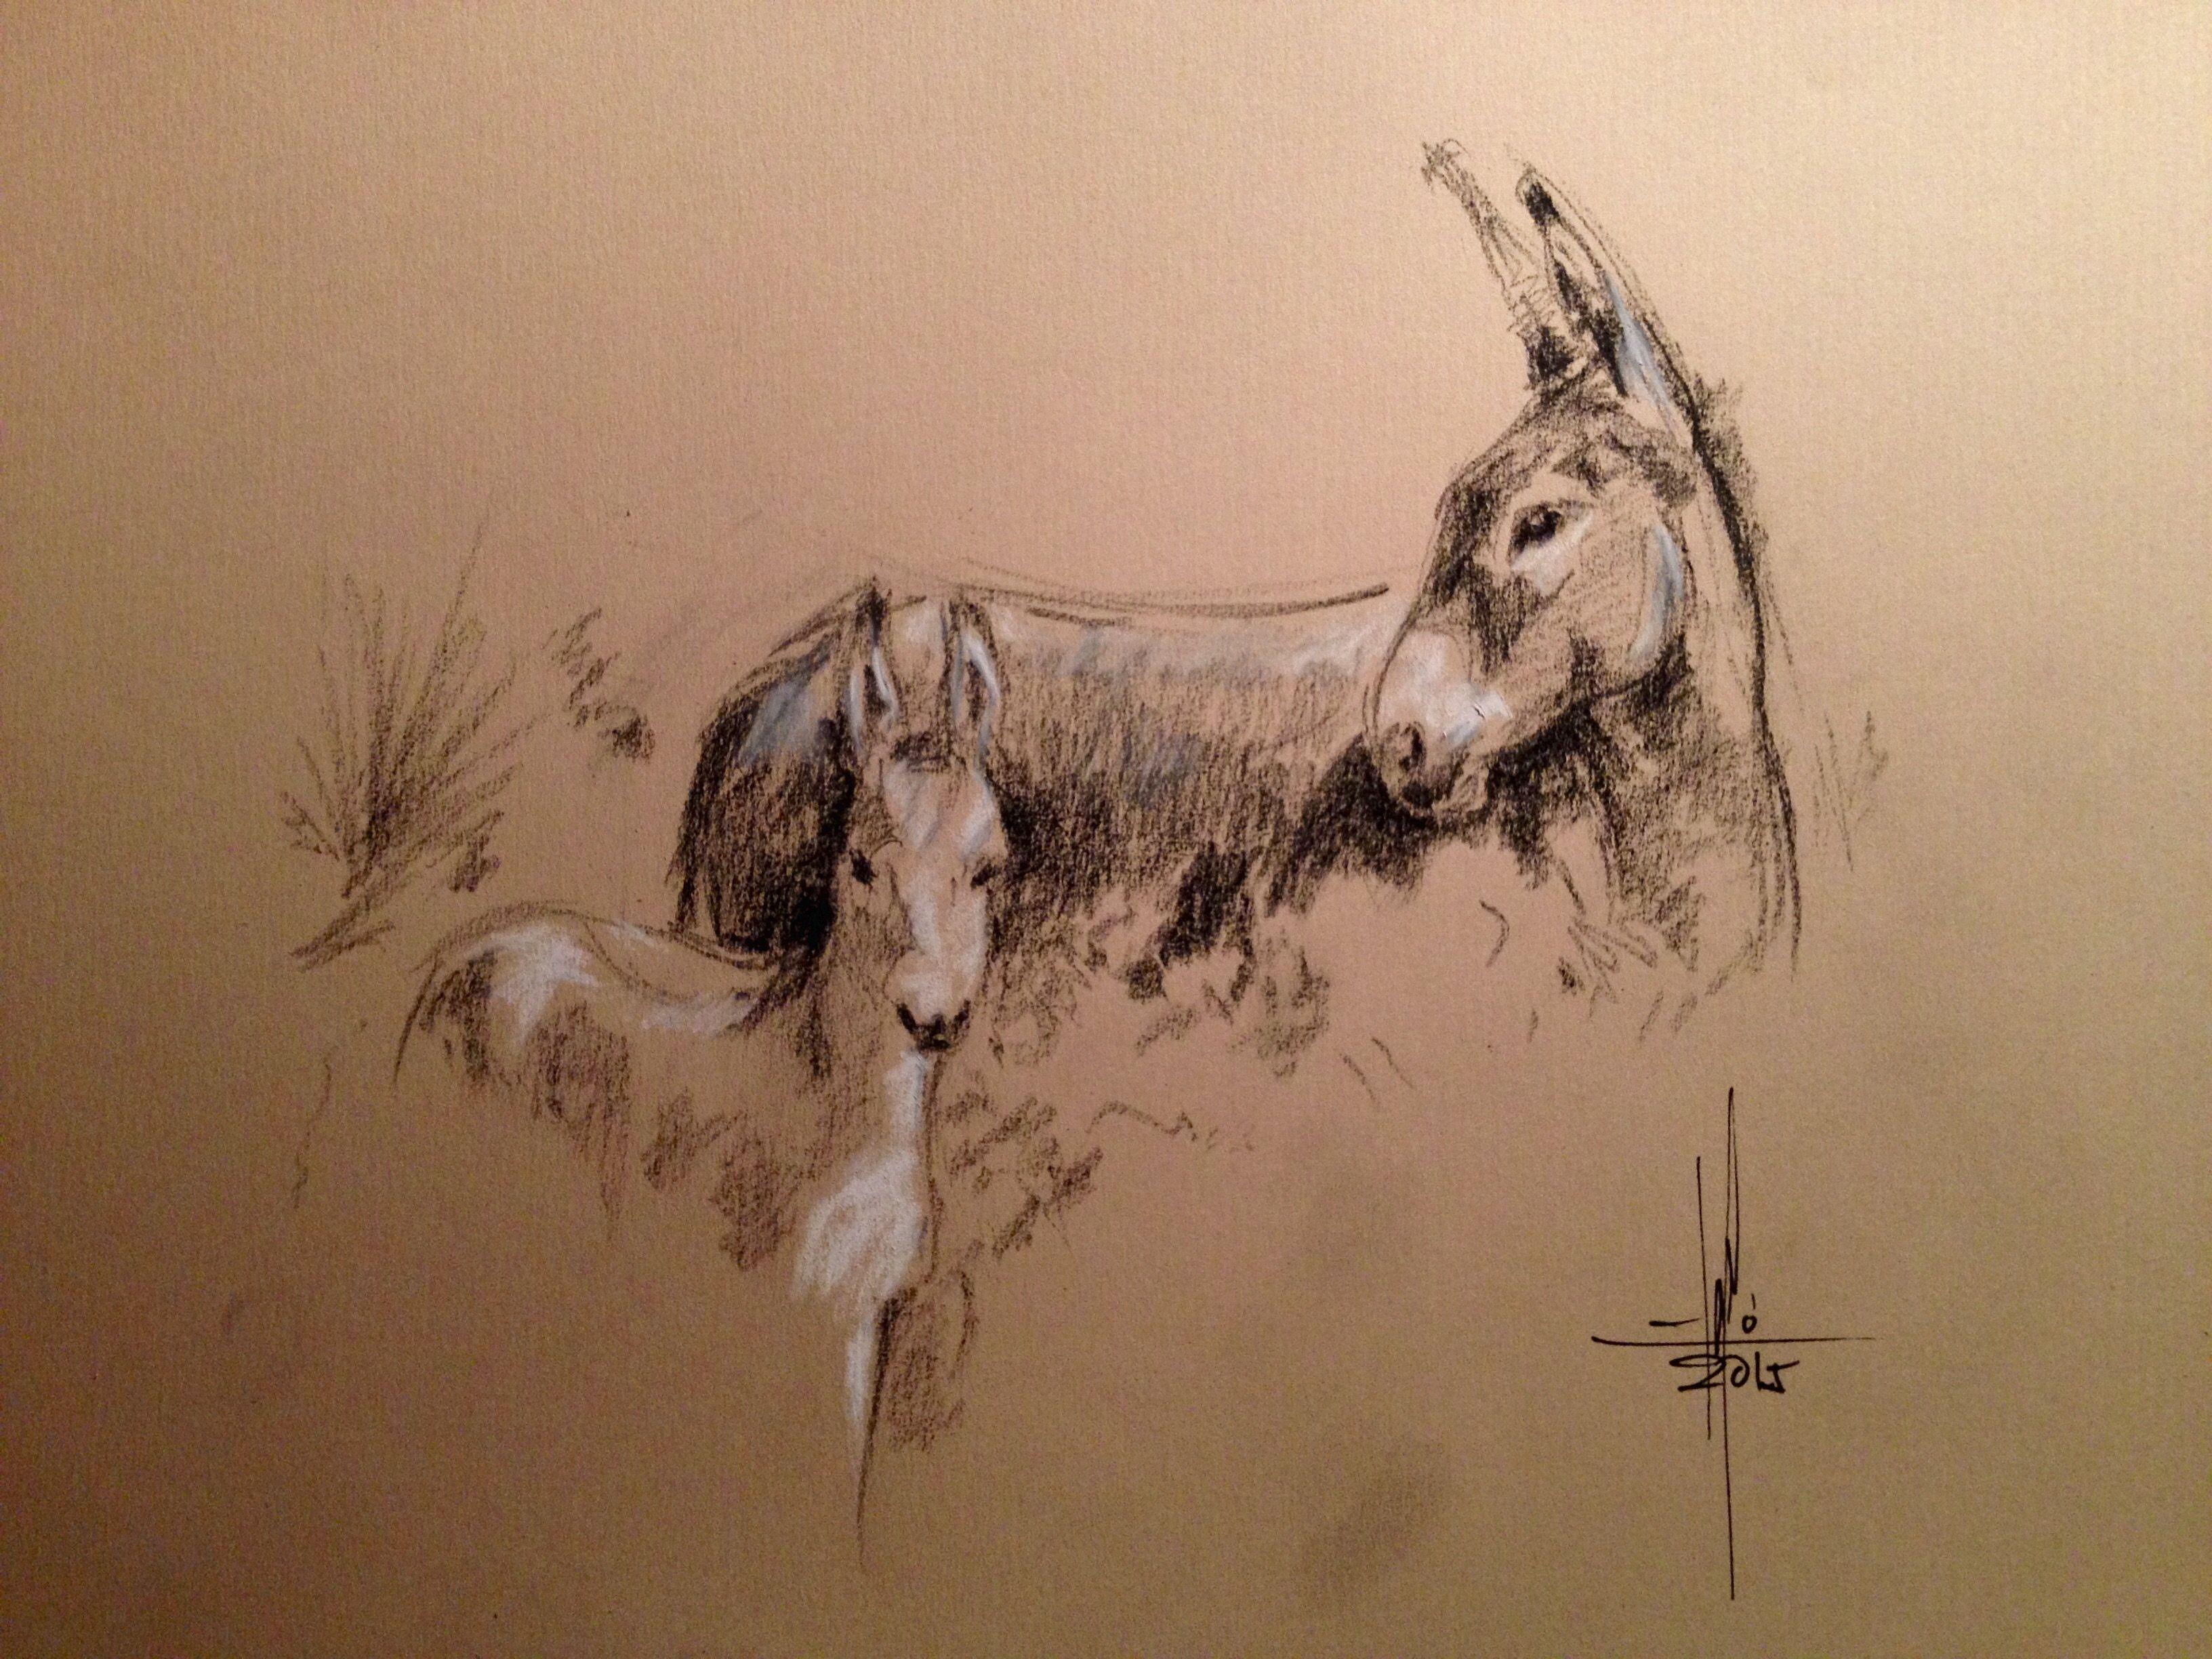 dibujo de burros a carbon sobre papel canson simil kraft dibujos dibujo de burros a carbon sobre papel canson simil kraft